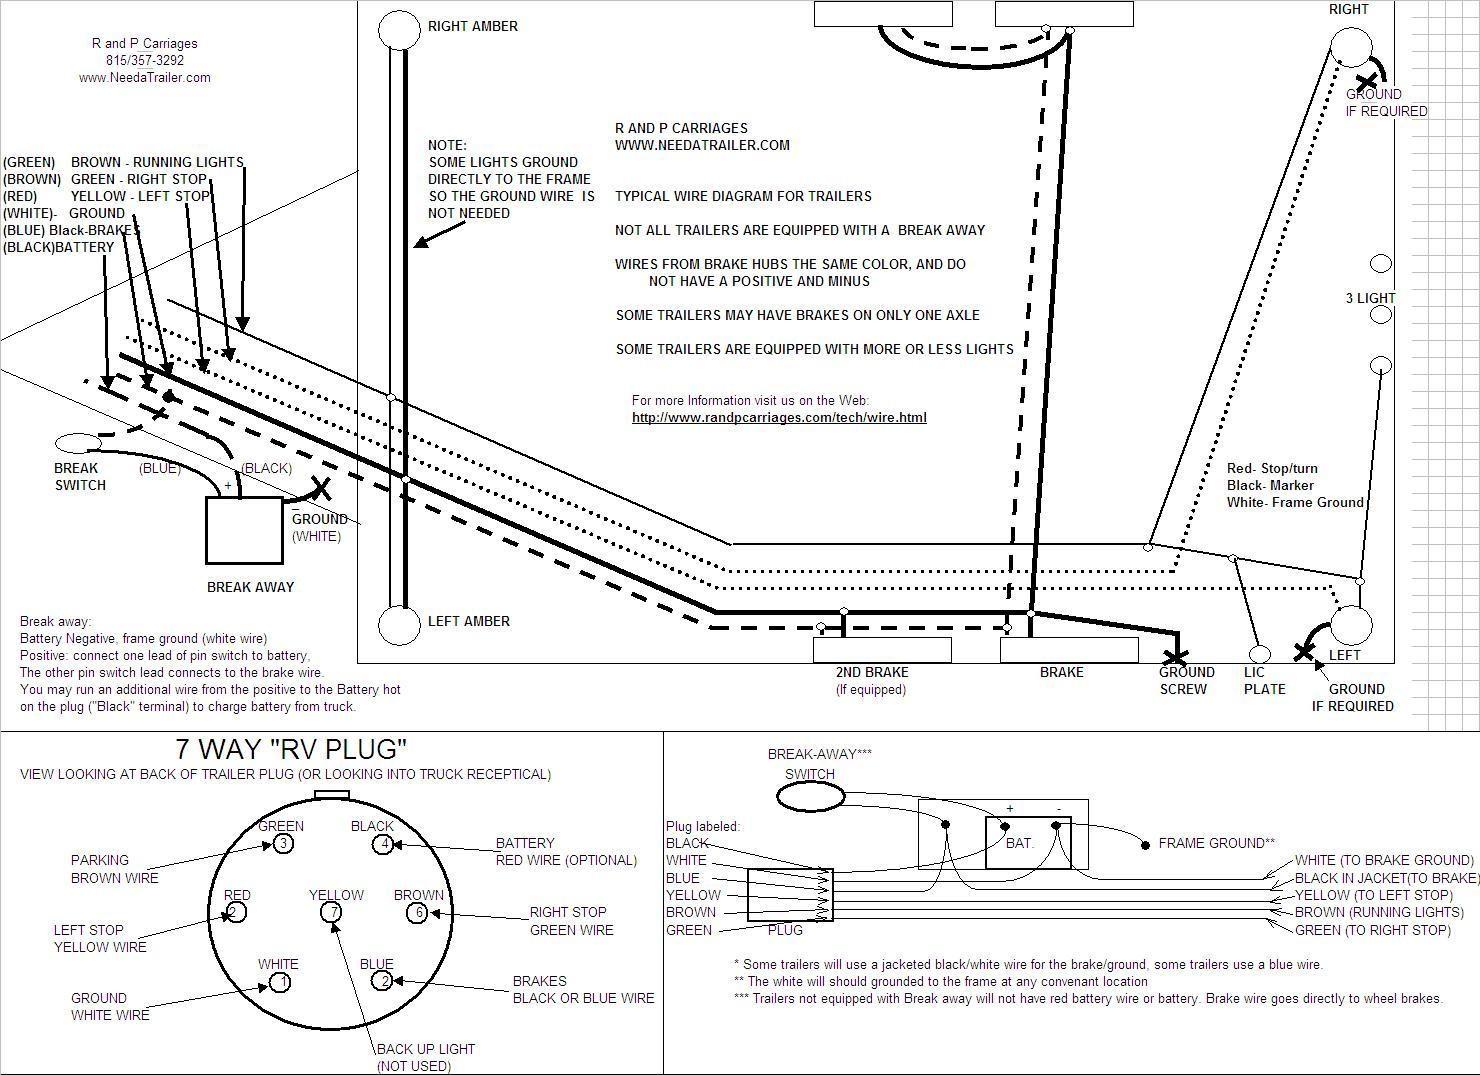 Trailer Brakes Wiring Diagram Electric For 7 Way Jpg 2